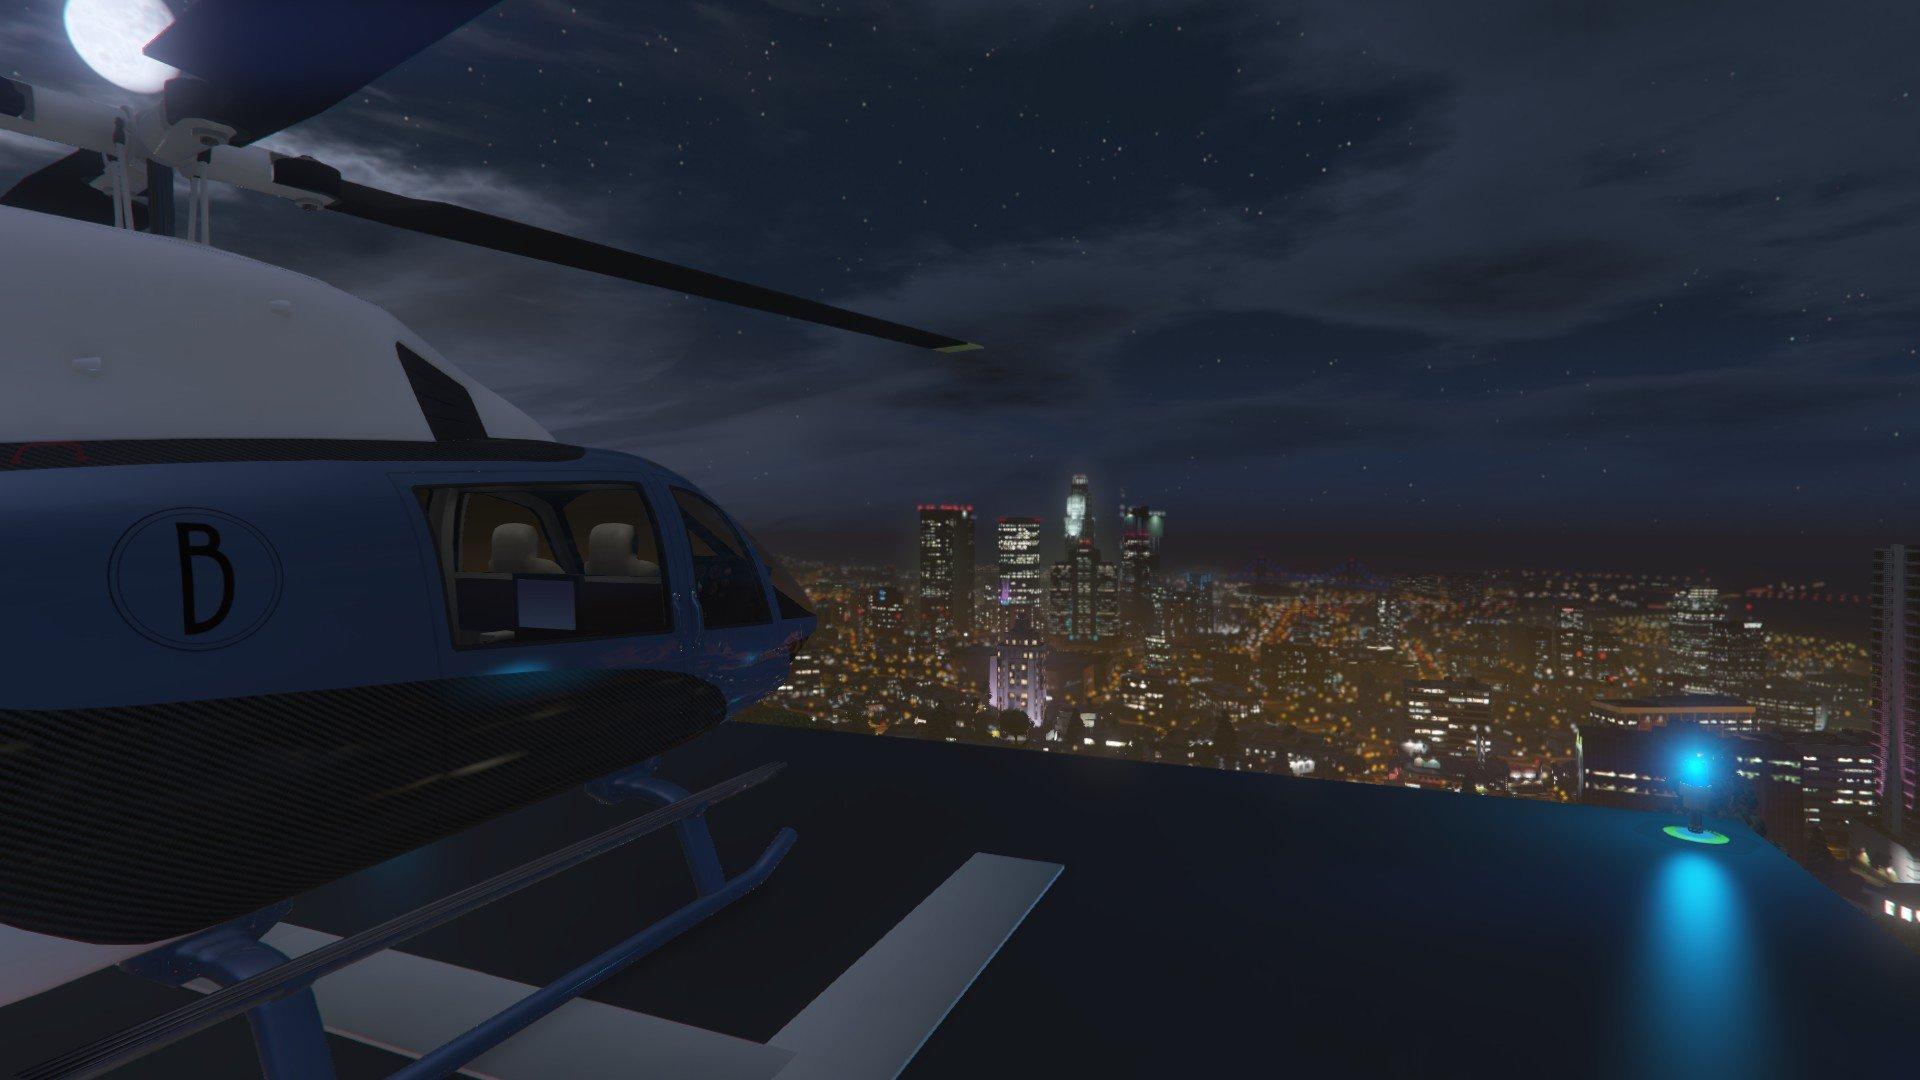 Bel Air Billionaire Gta5 Mods Com